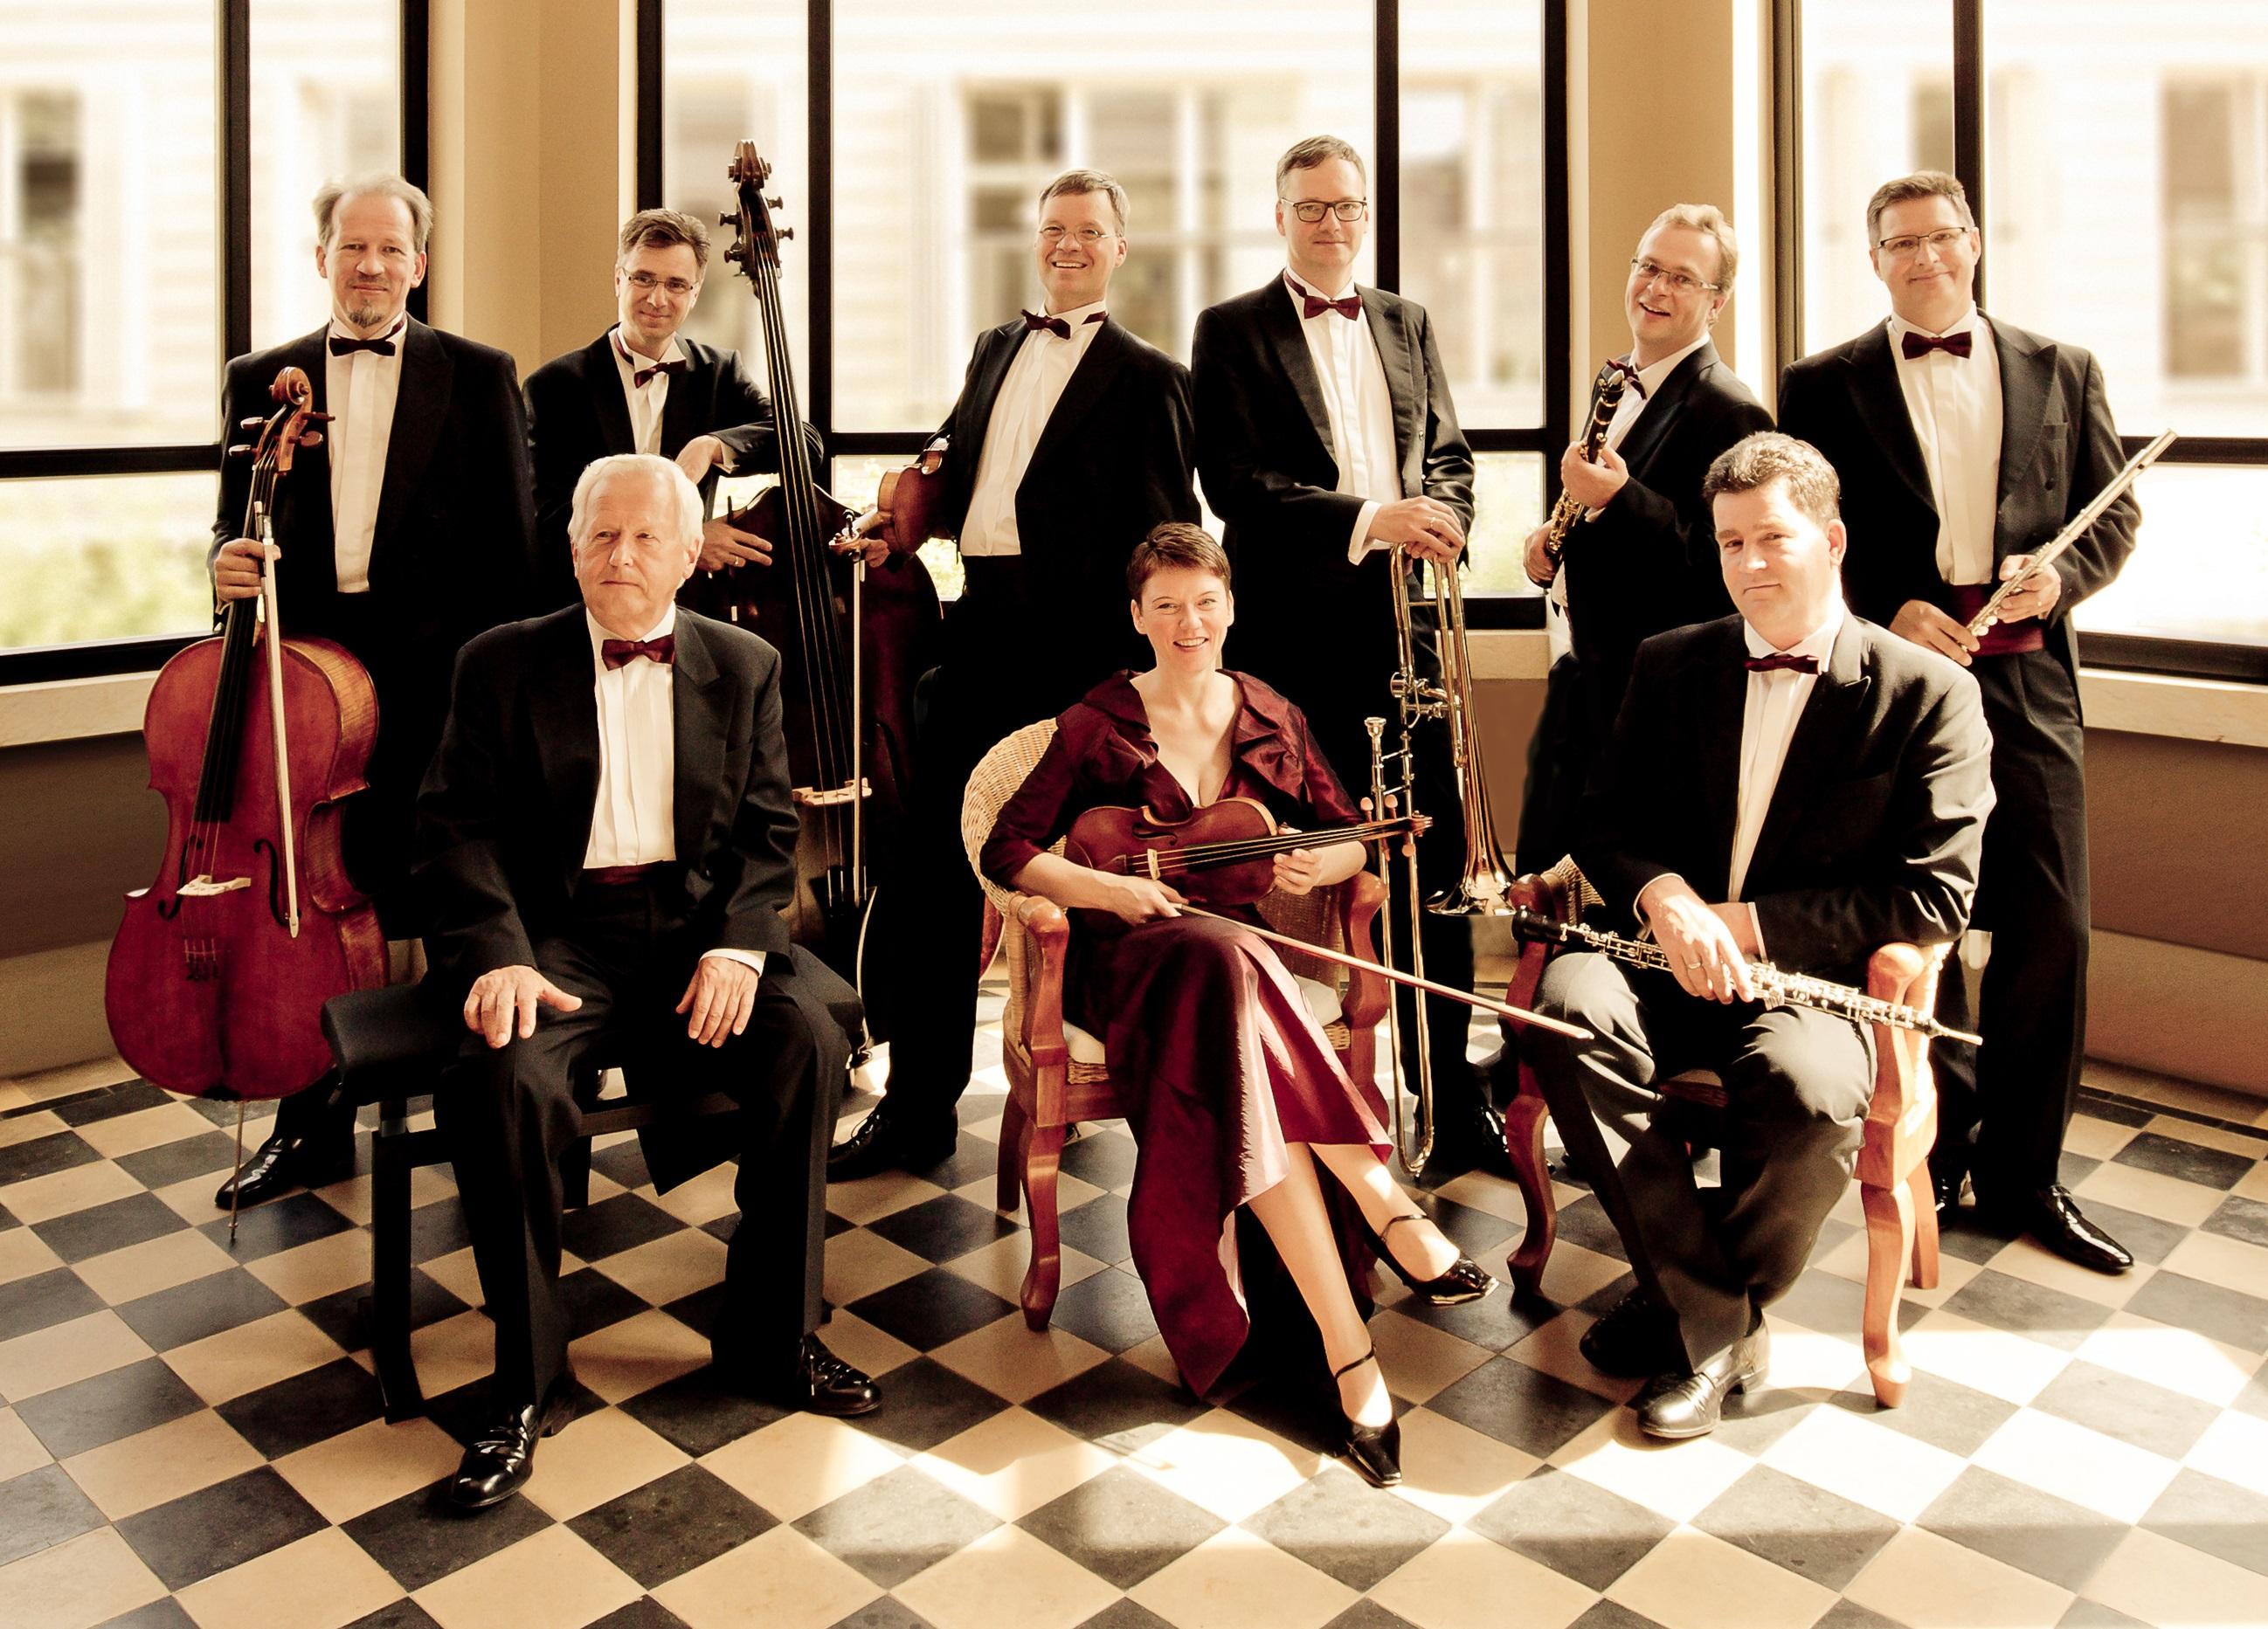 2018-08-19_Salonorchester_Cappuccino___Anne_Hornemann-6094b